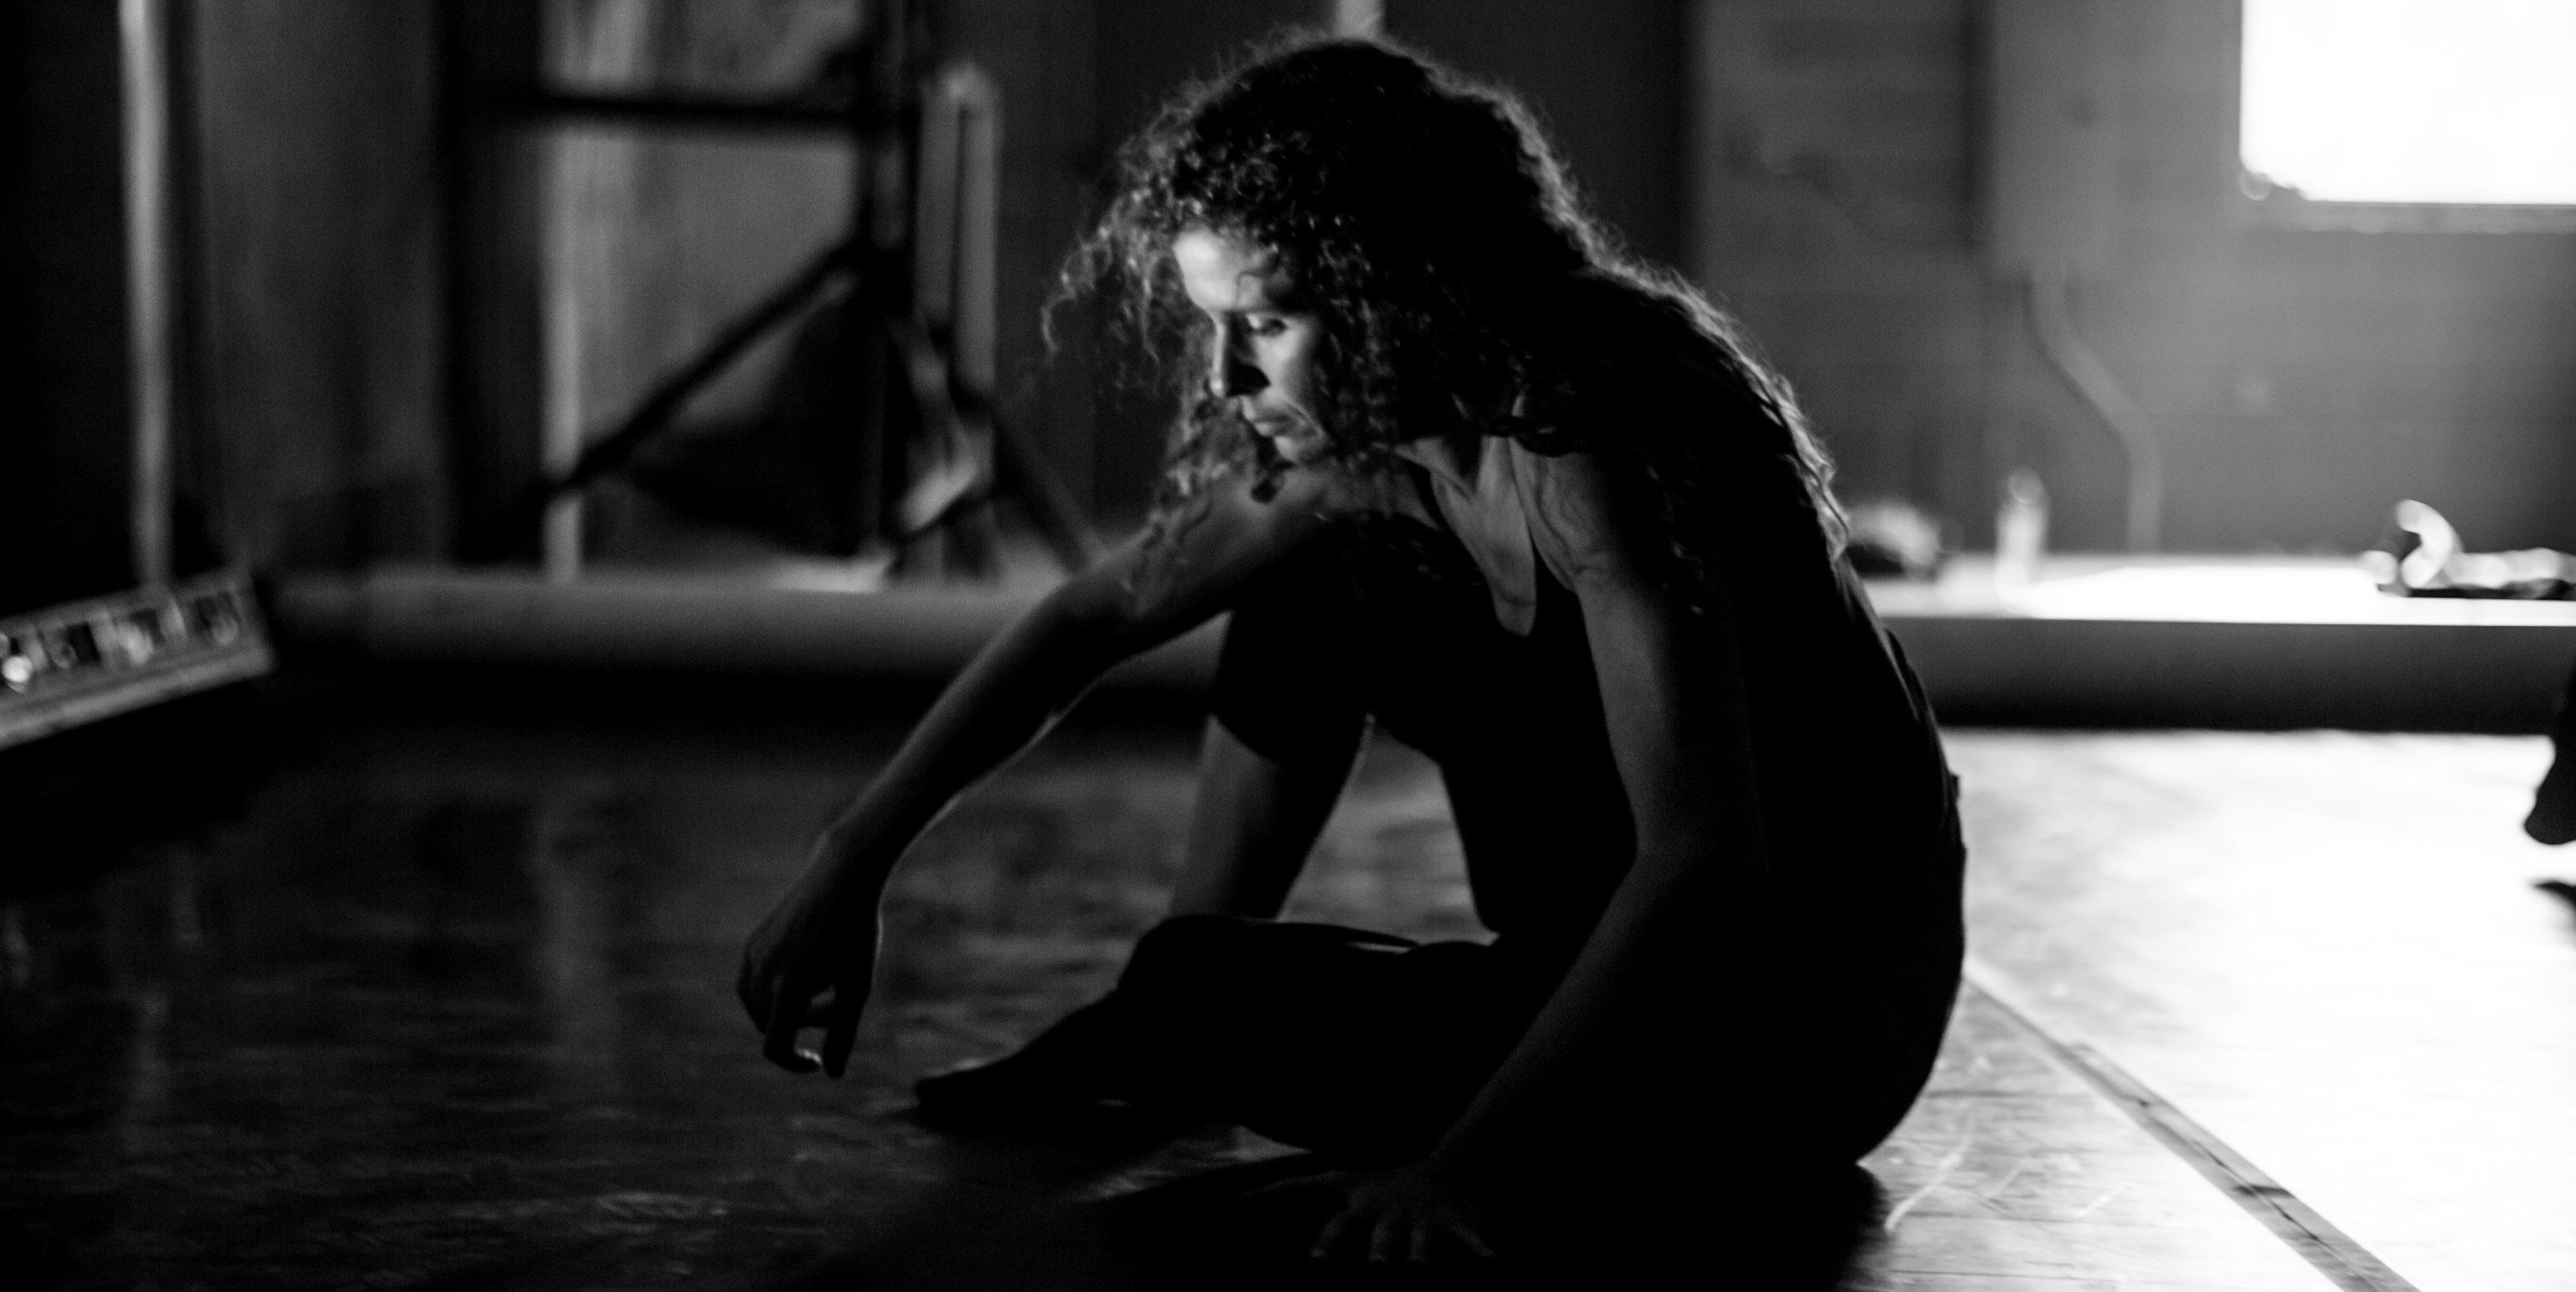 Everyday Icon: The Dancer